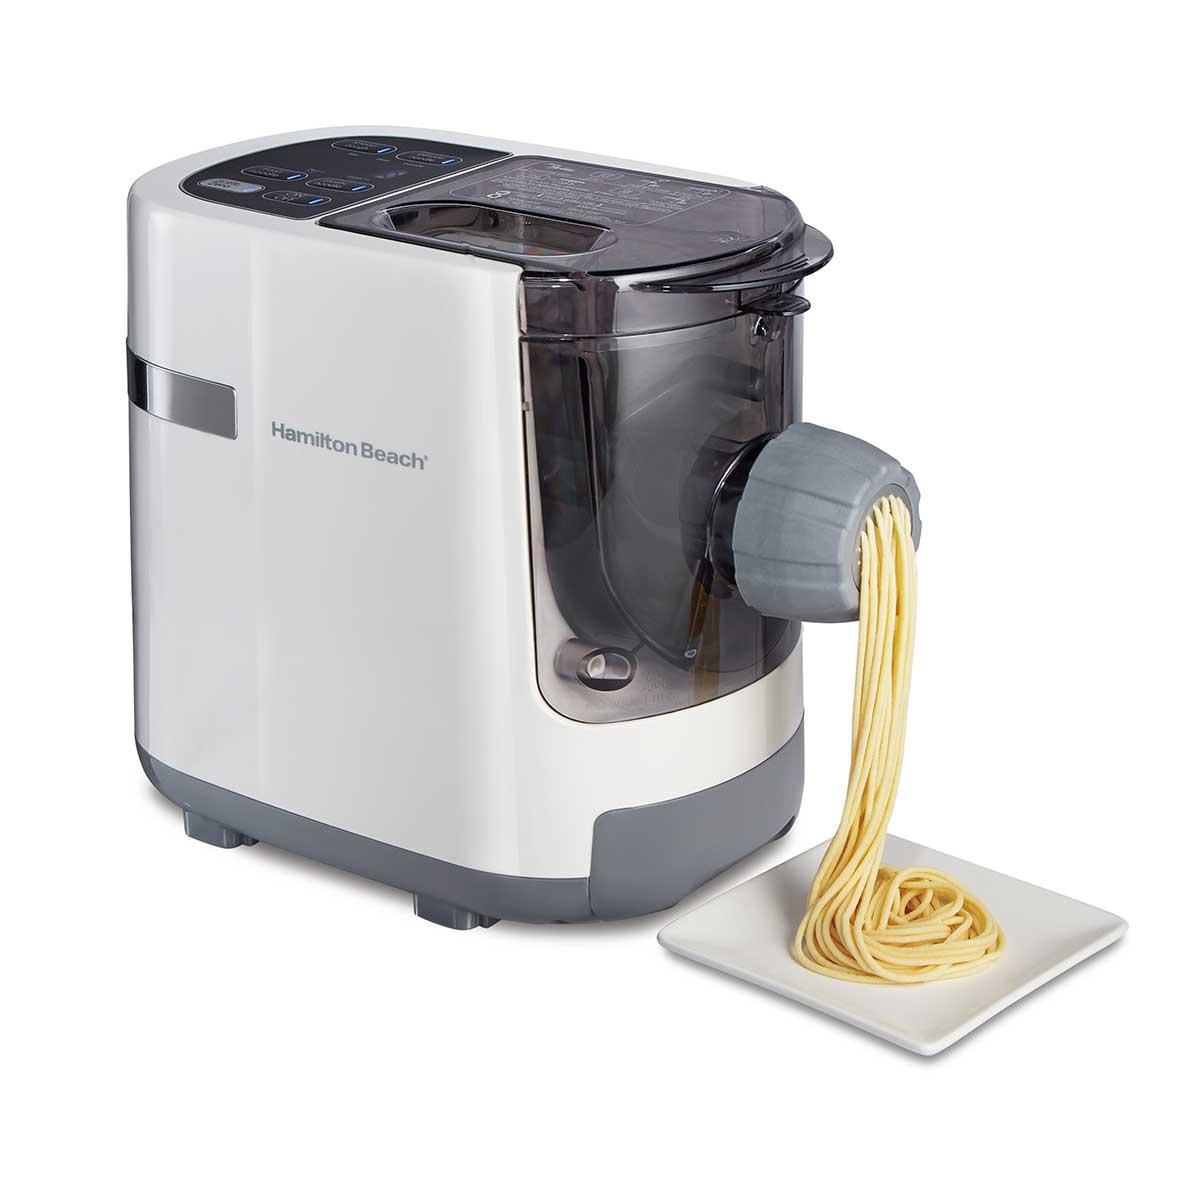 Hamilton Beach Electric Pasta Maker 86650